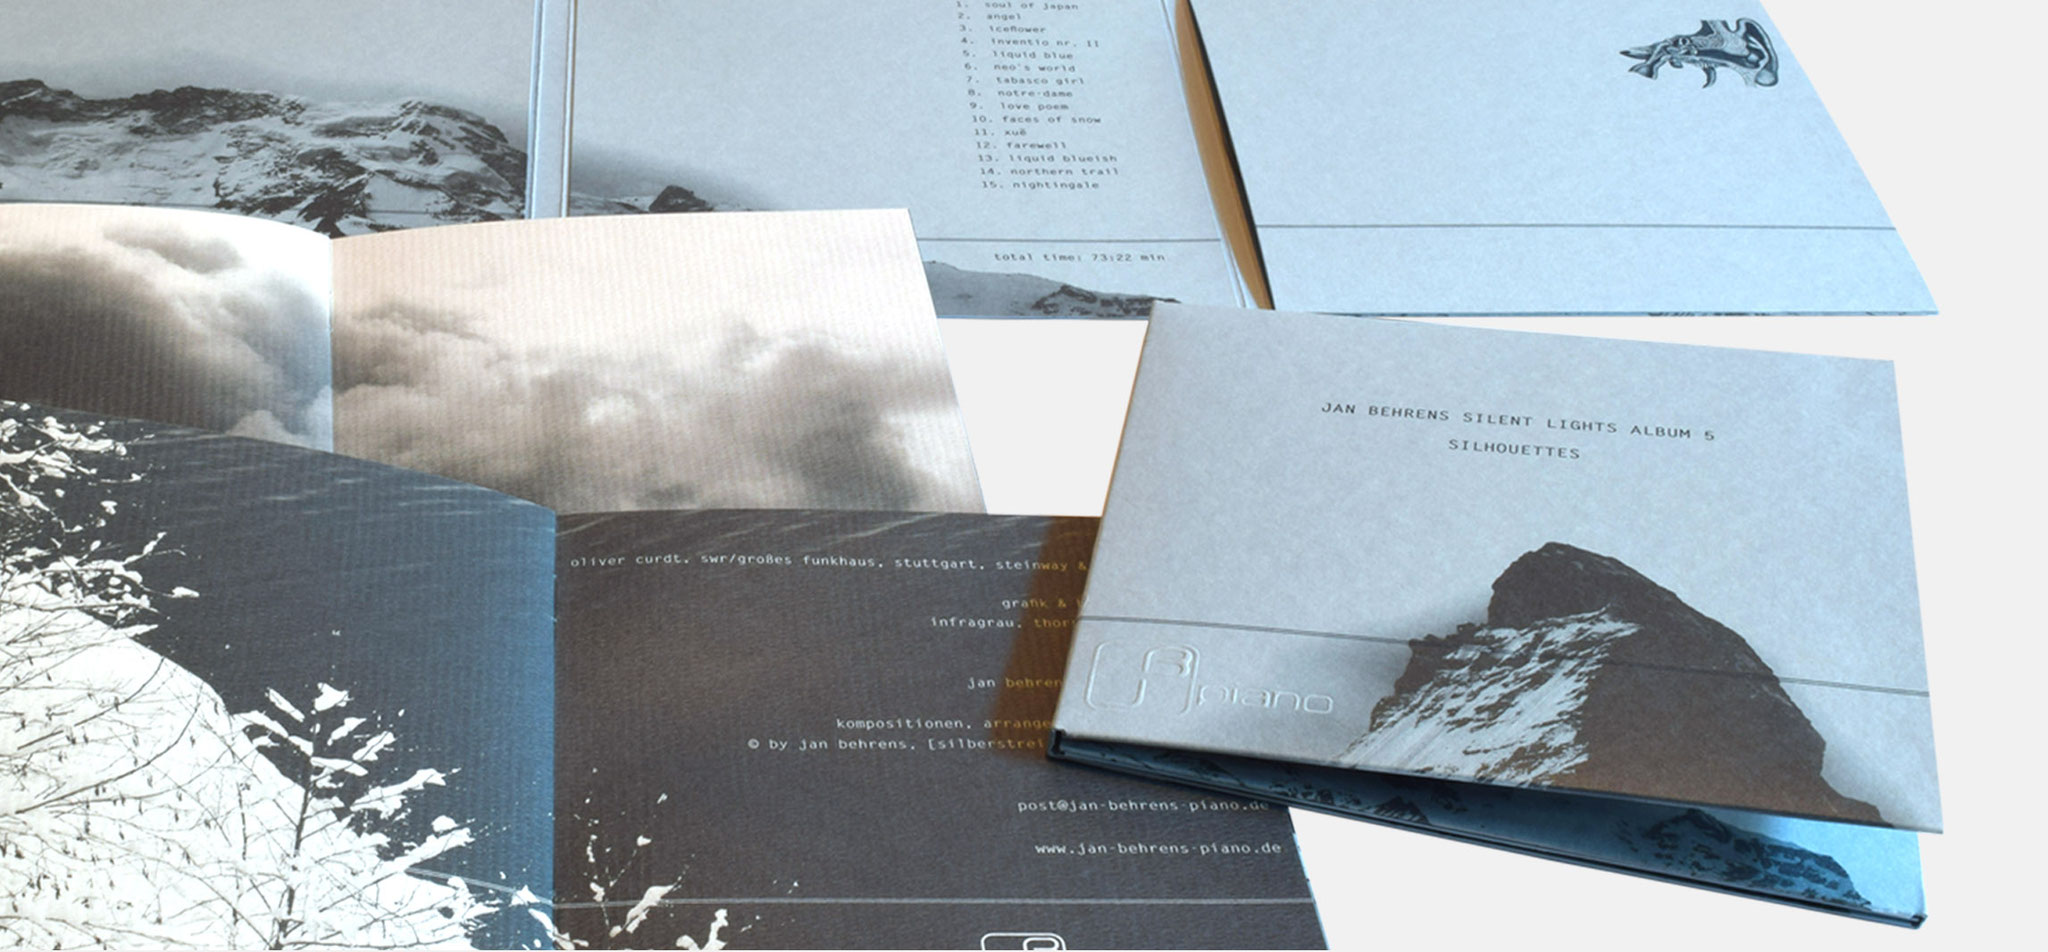 JAN BEHRENS | audiophile serie silent lights – infragrau, gute gestaltung